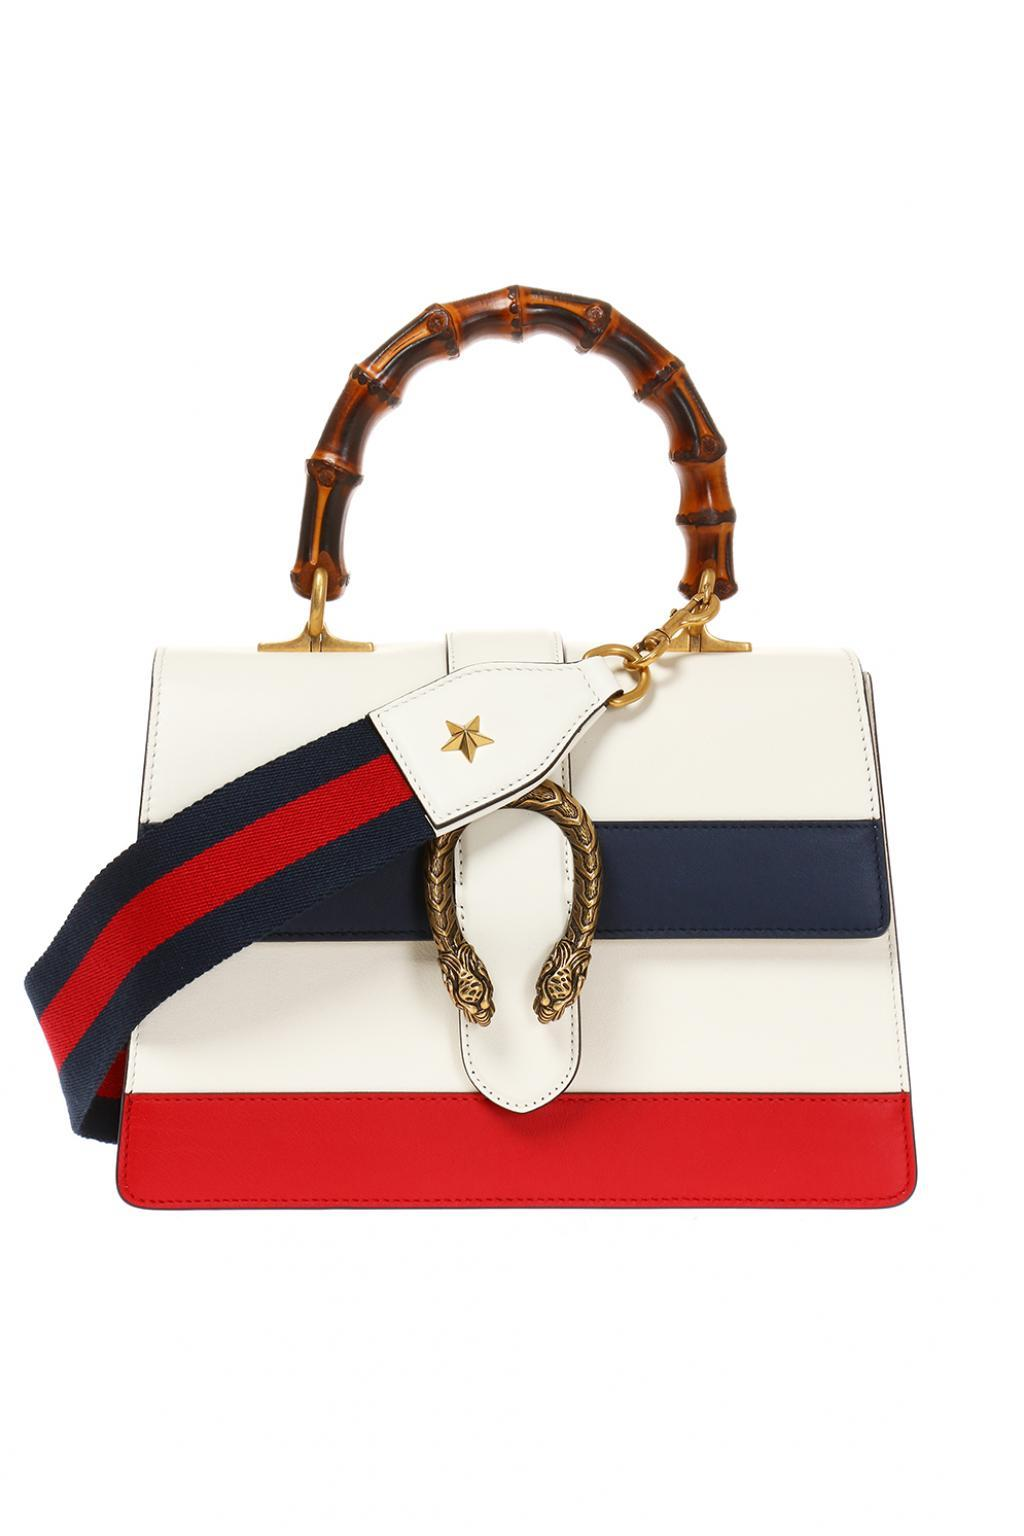 aa239baf0cd Lyst - Gucci  dionysus  Shoulder Bag in White - Save 17%